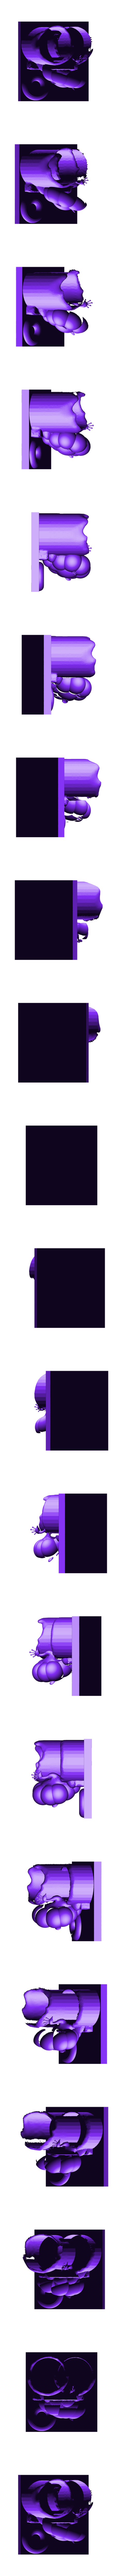 lion_sd_pen-2-6.stl Download free STL file Double face pen holder ( Lion and Peacock) • 3D printer template, 3DP_PARK